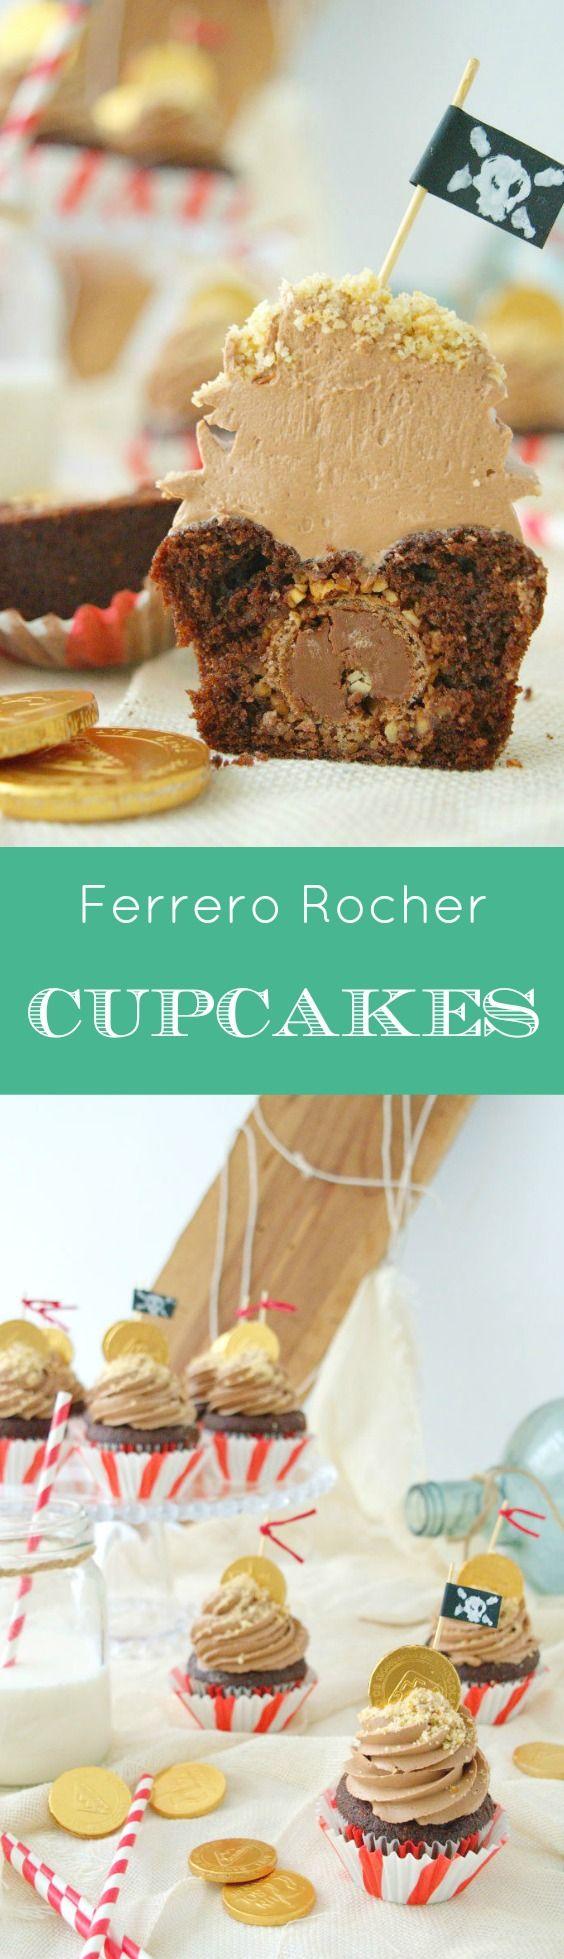 Ferrero Rocher Chocolate cupcakes and a pirate party - Englsih recipe included - Cupcakes de chocolate y Ferrero Rocher para la fiesta pirata de Una Galleta, un cuento.